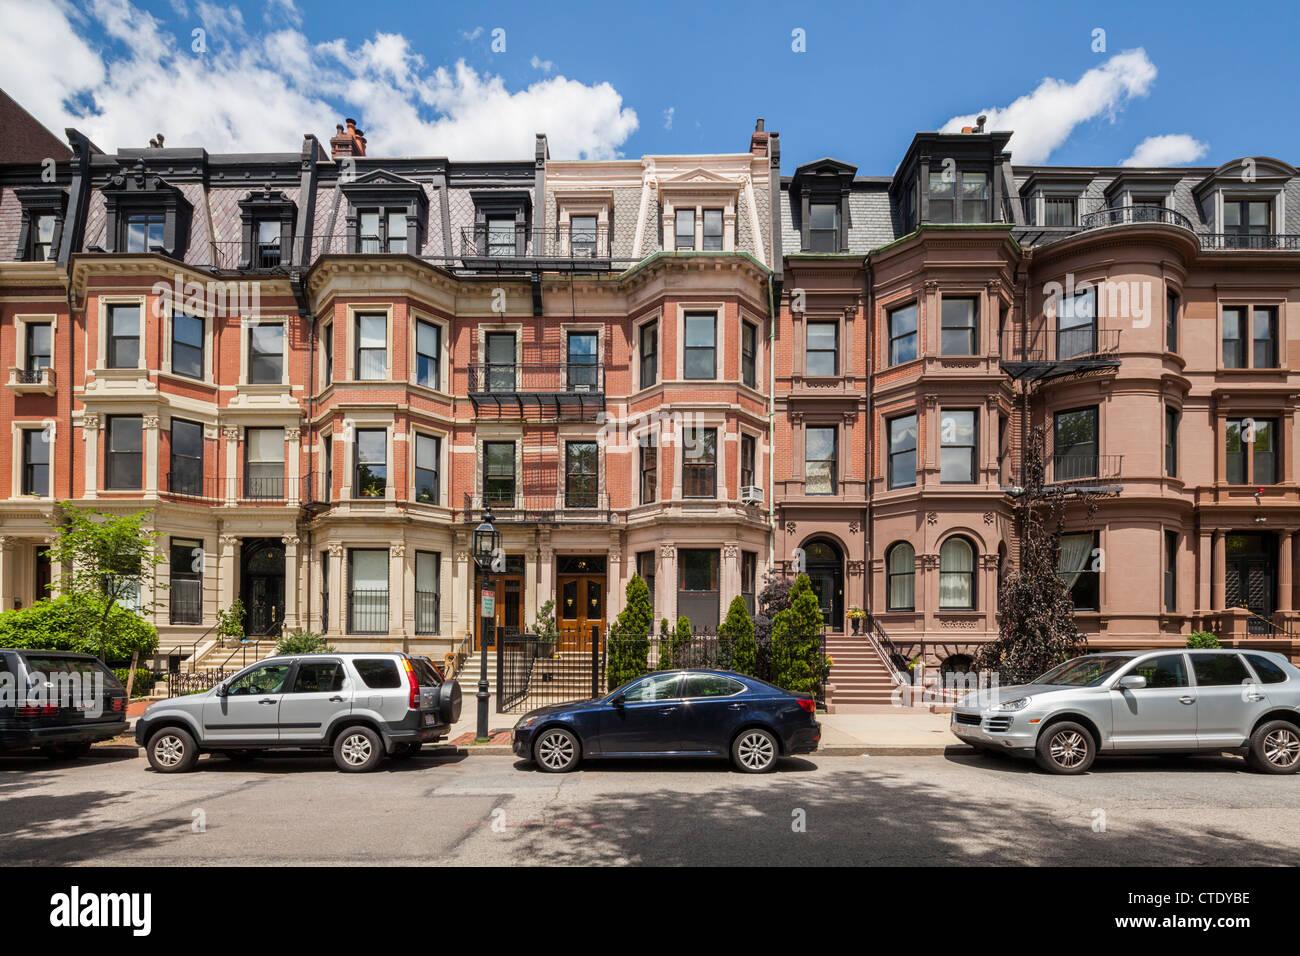 Commonwealth Avenue Victorian Houses, Boston - Stock Image